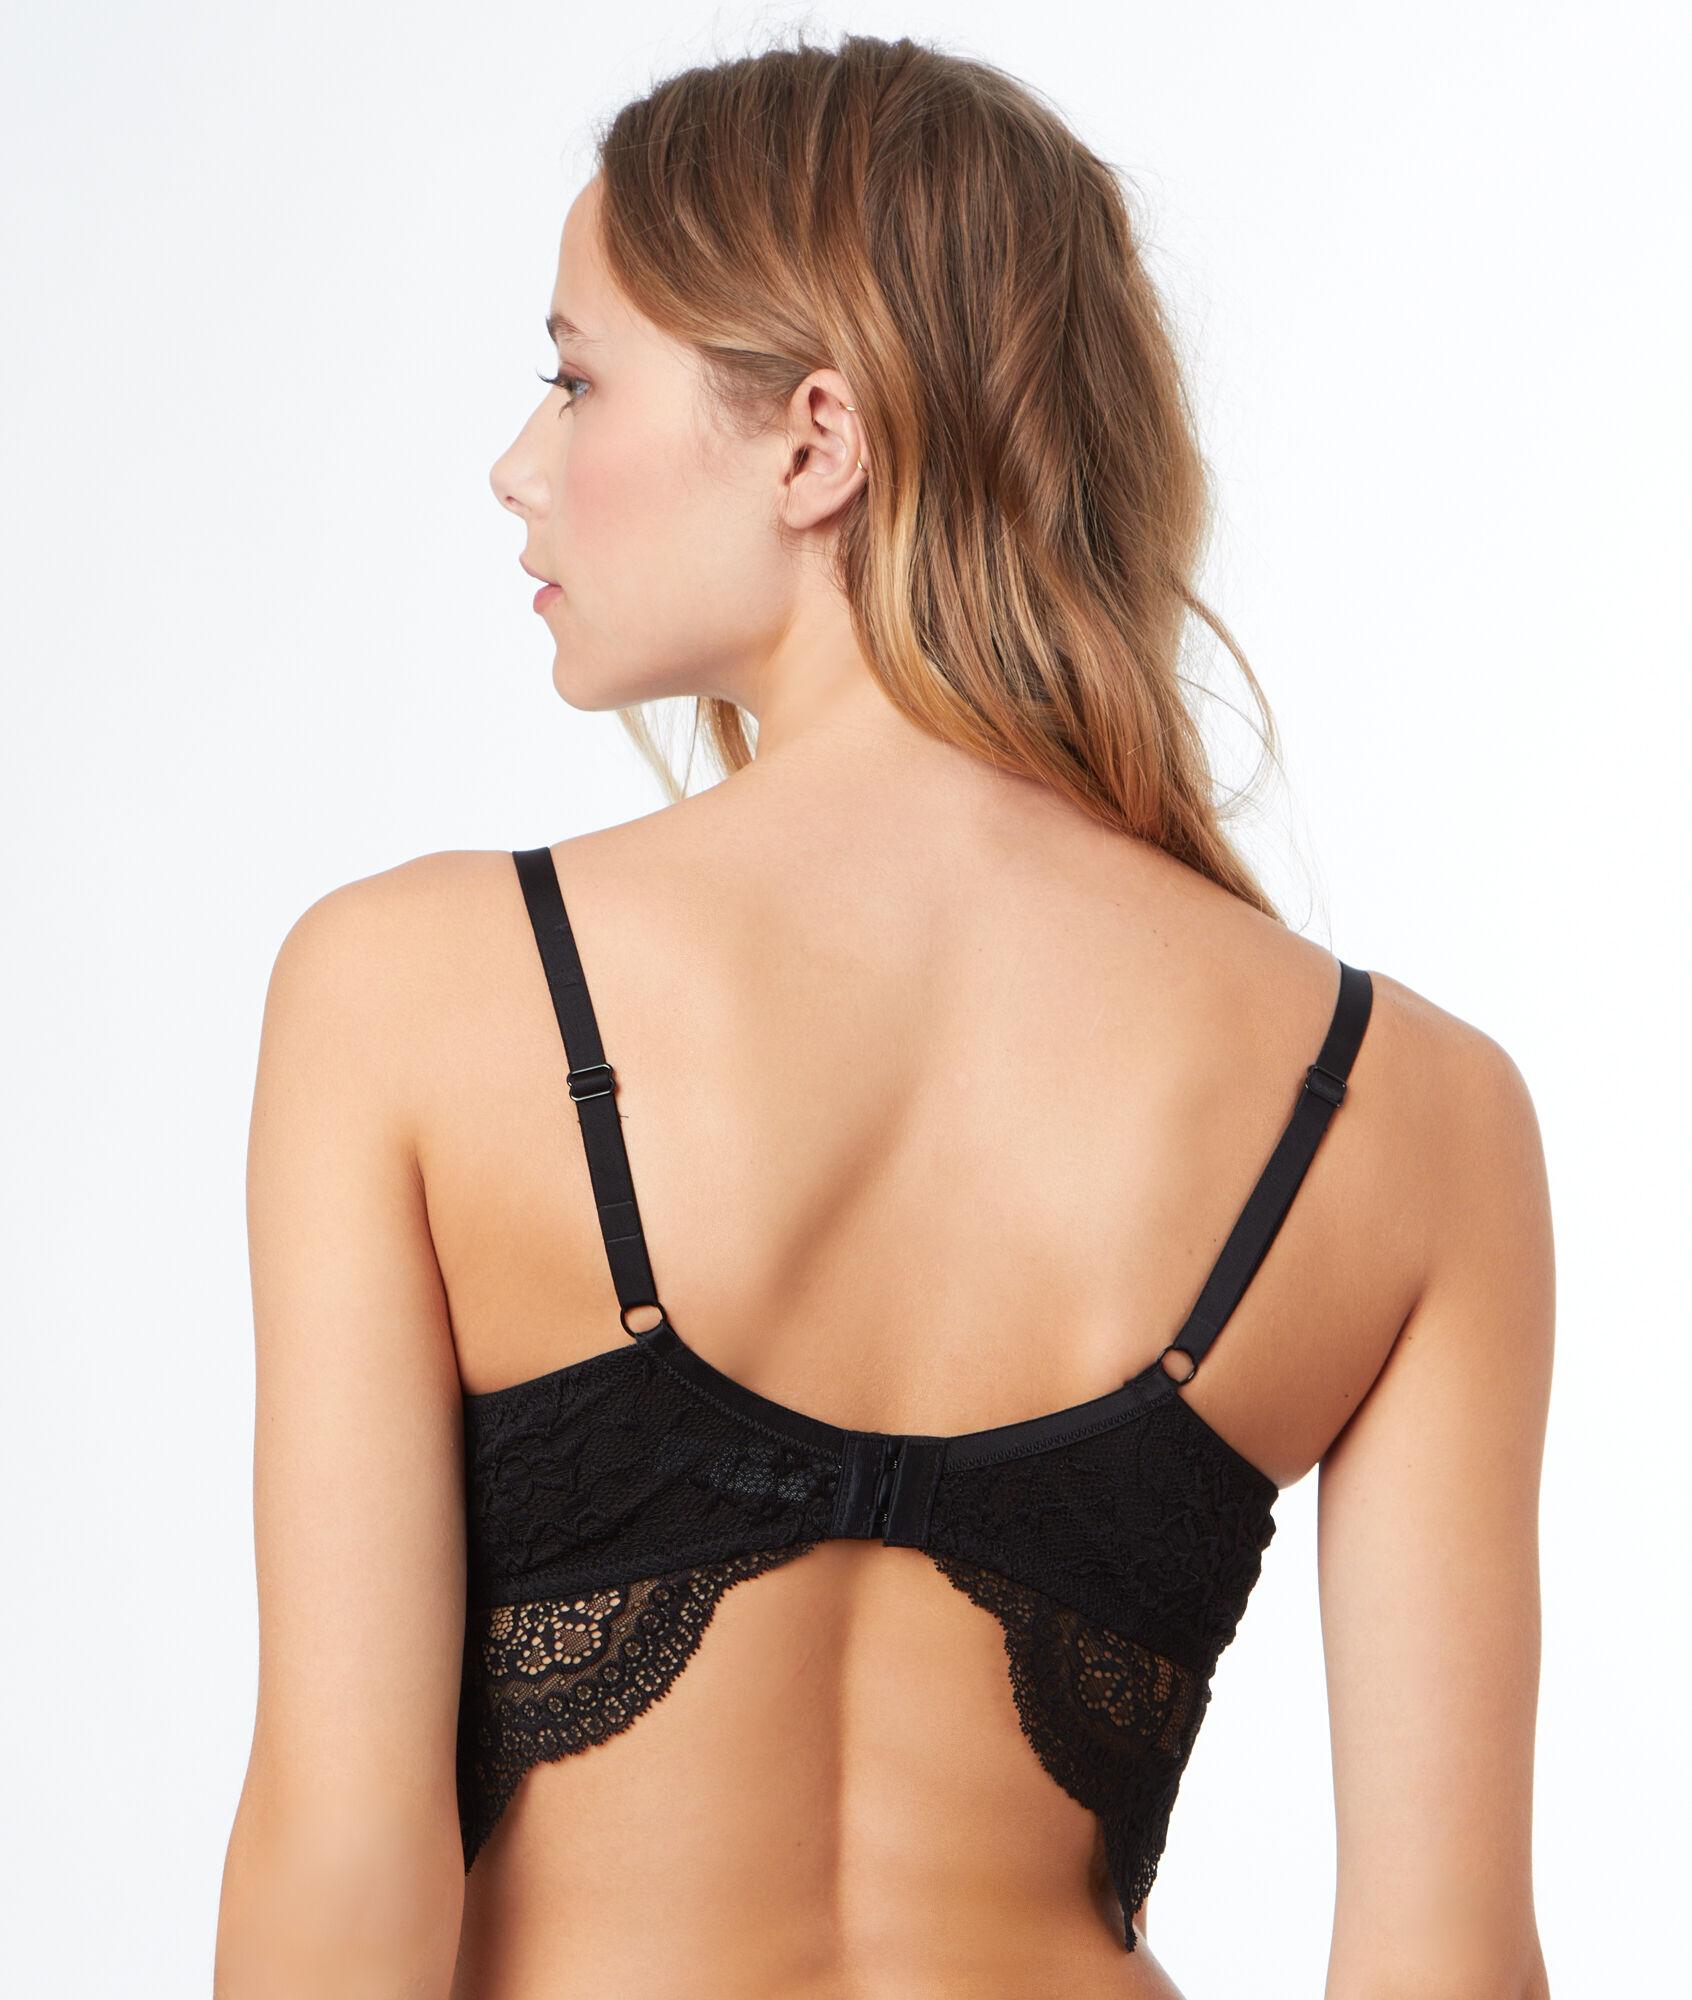 f1c4c2256d5 Bra No. 5 - Classic padded bra with lace underband - Etam